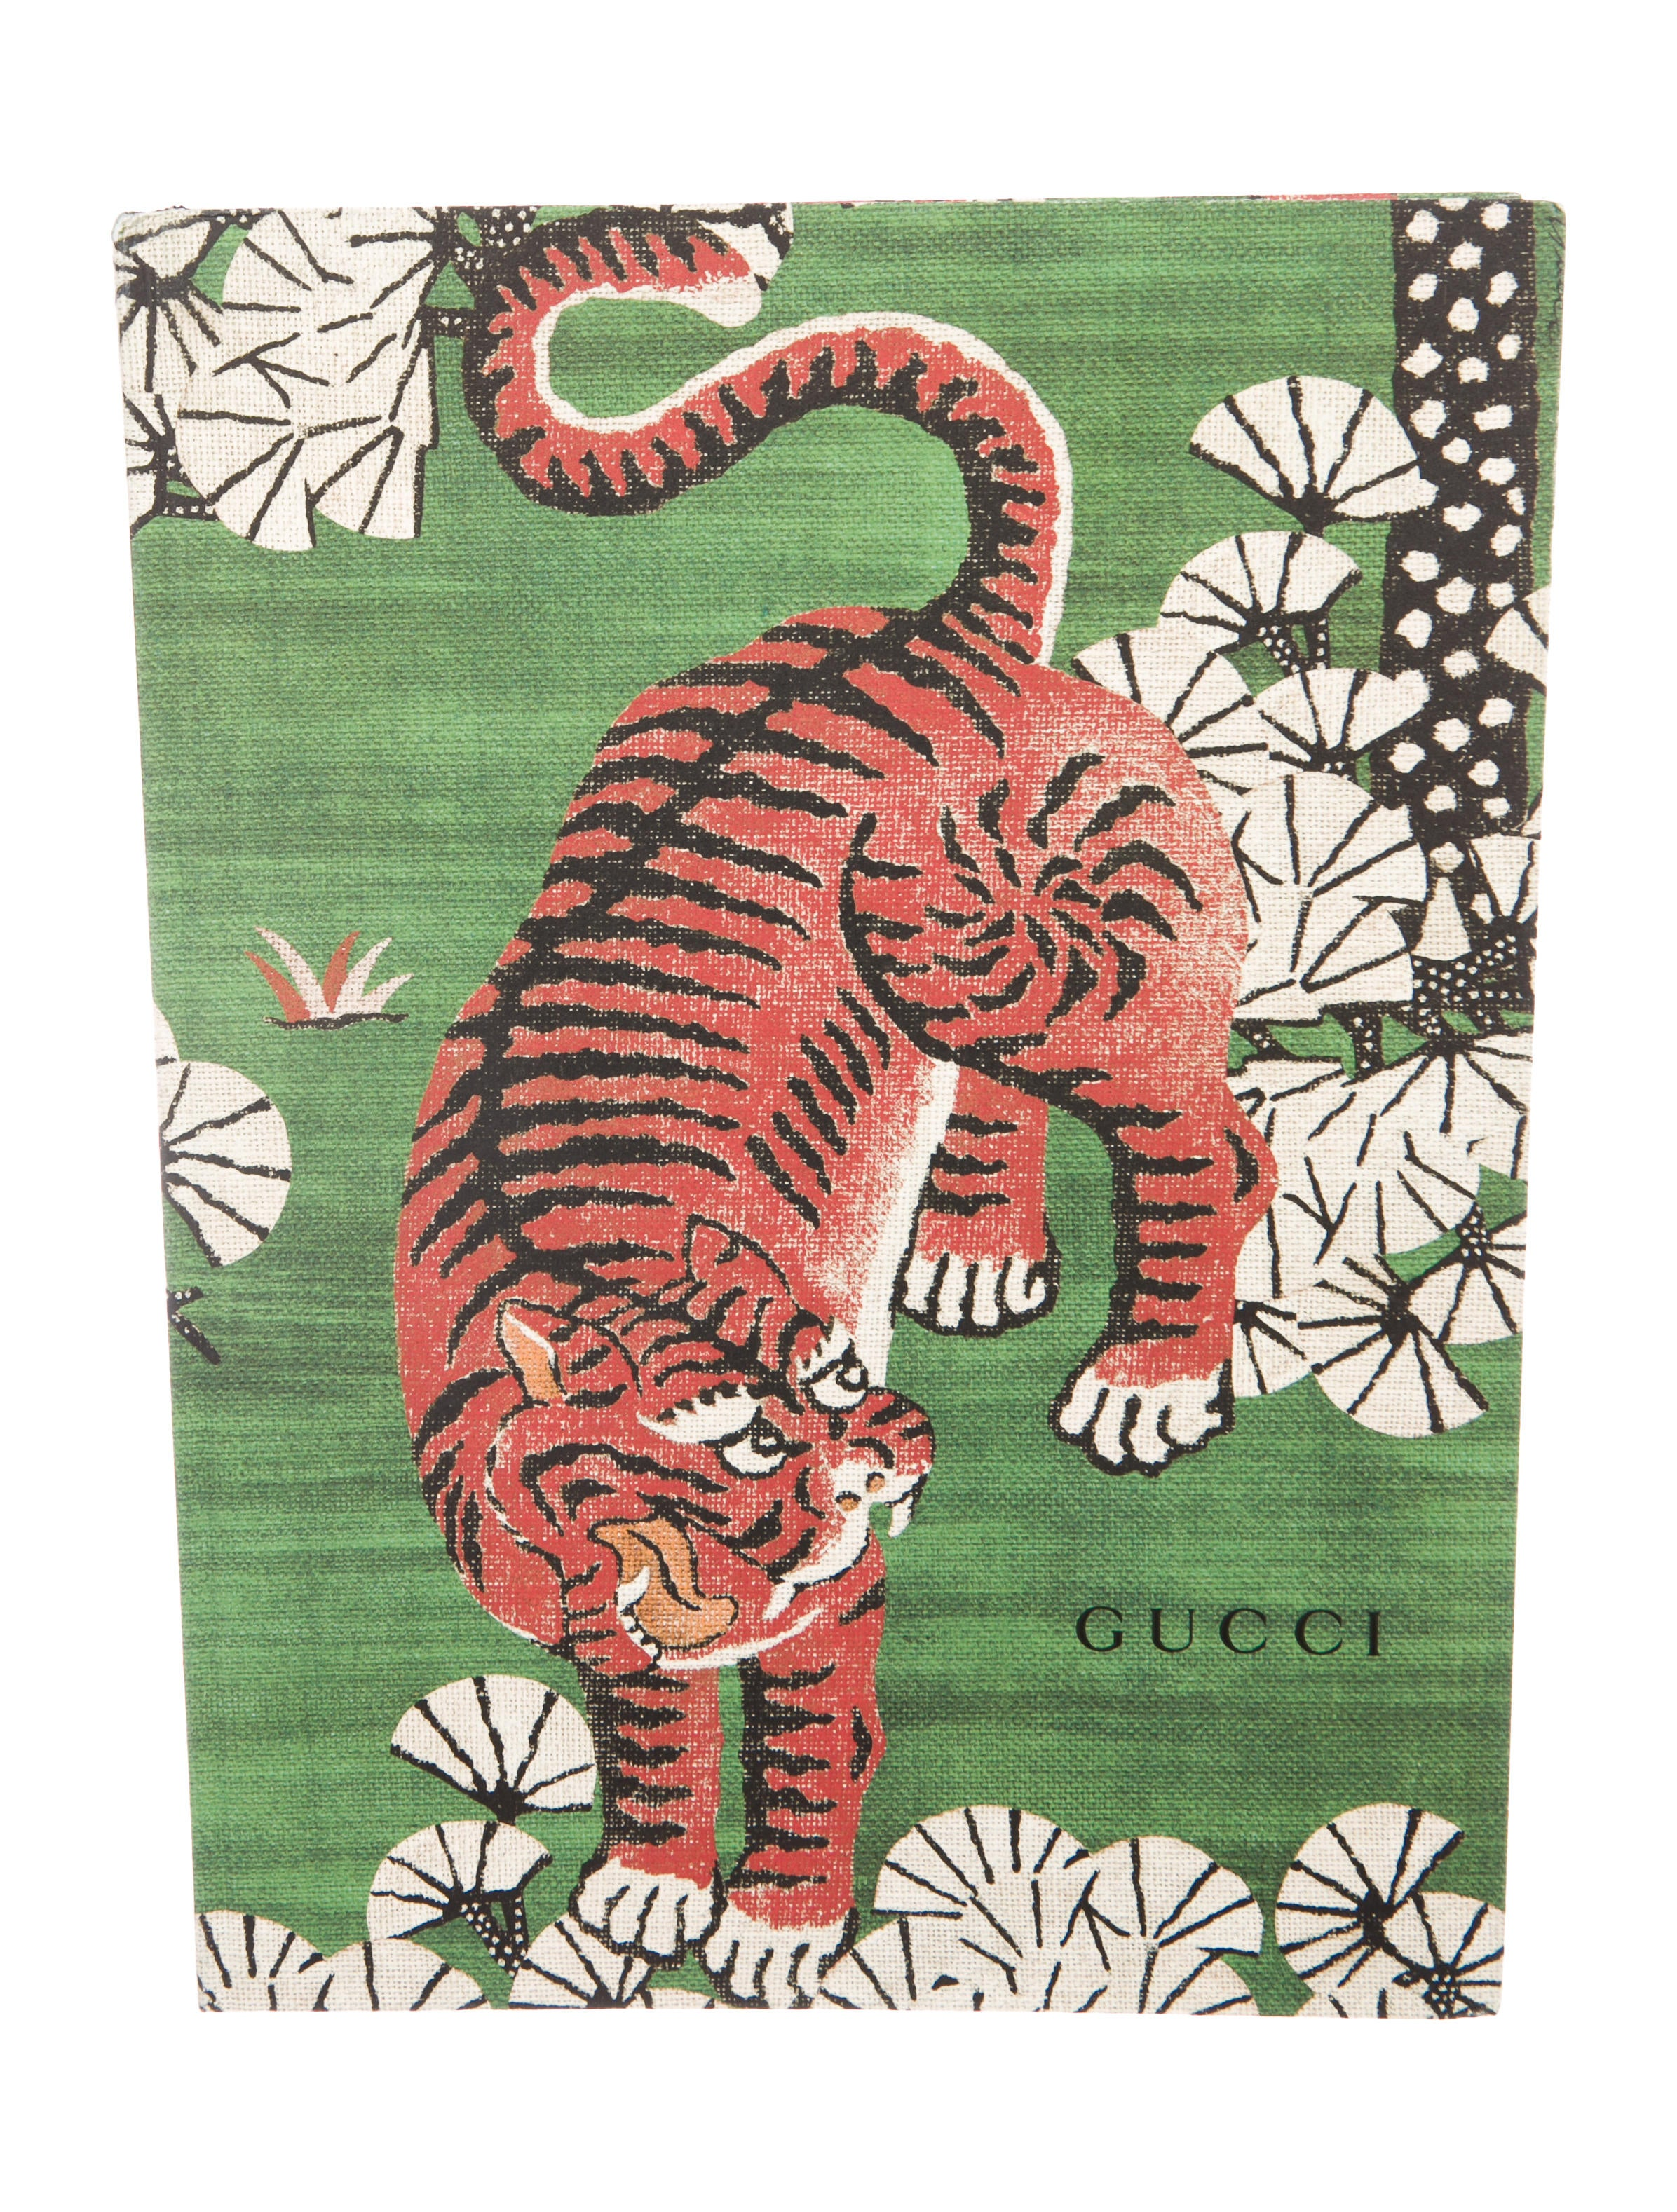 b5cf9be1fdb Gucci Bengal Tiger Journal - Decor   Accessories - GUC246950